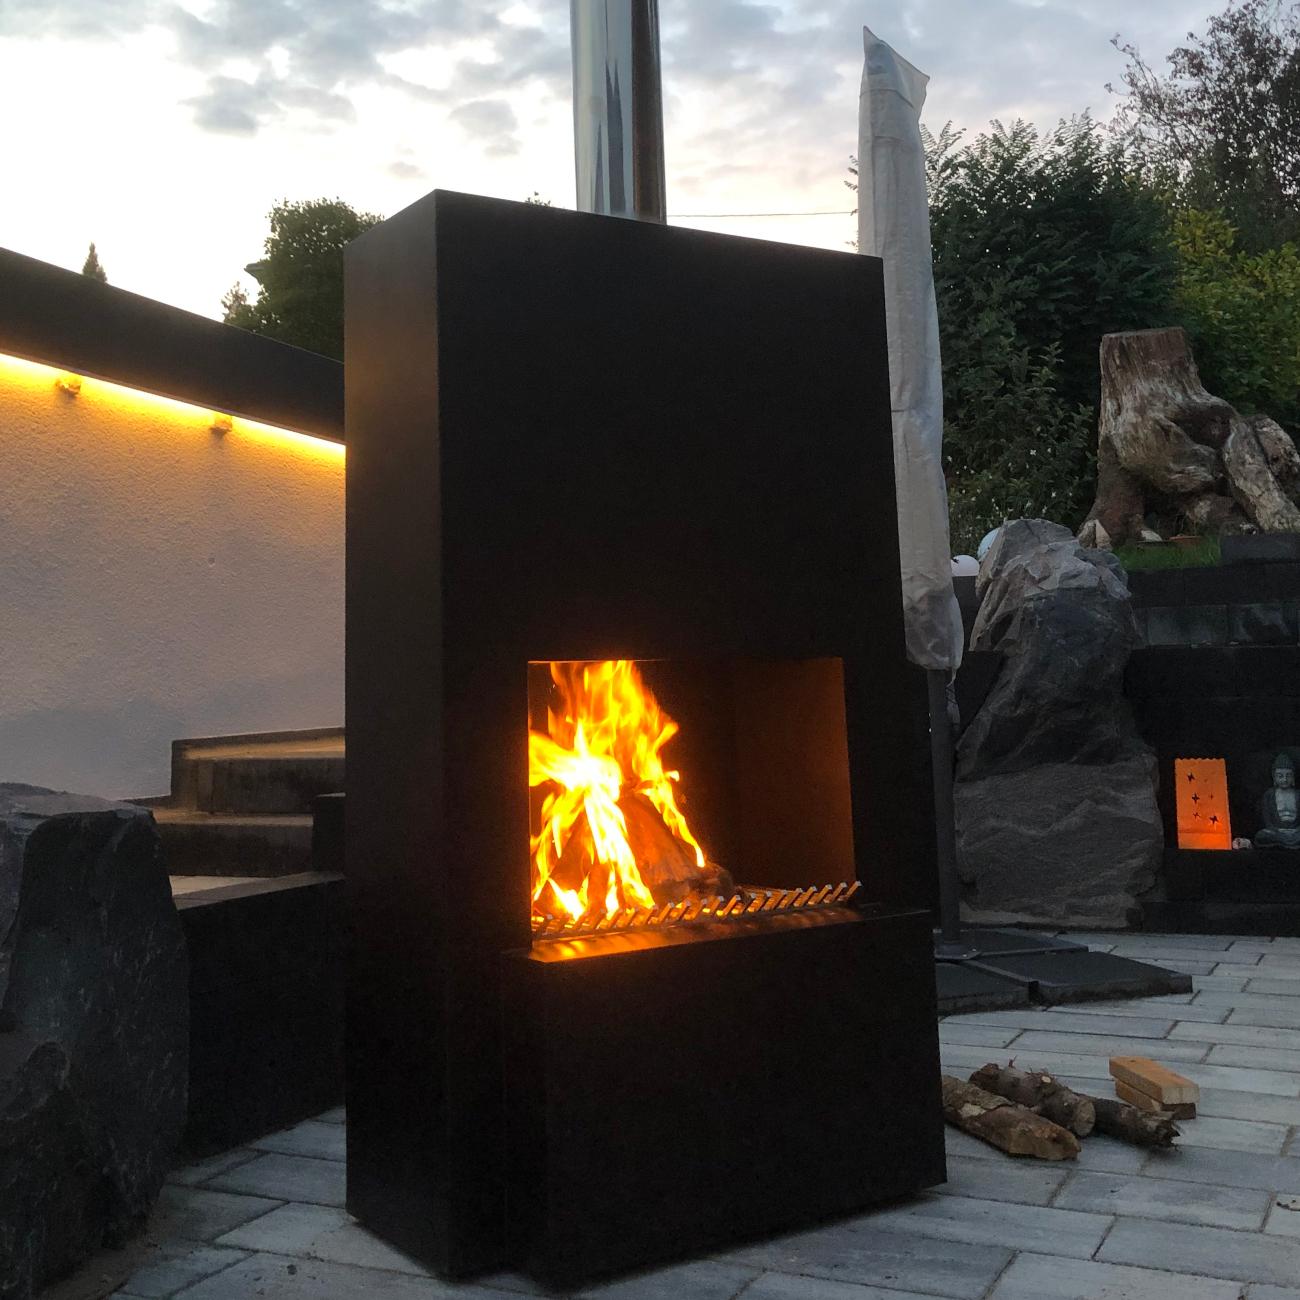 Outdoor Garten Kamin Feuersaule Pinacate In Schwarz Gartenkamine Und Feuerschalen Outdoor Derofenfuchs Kamin Und Energiestudio